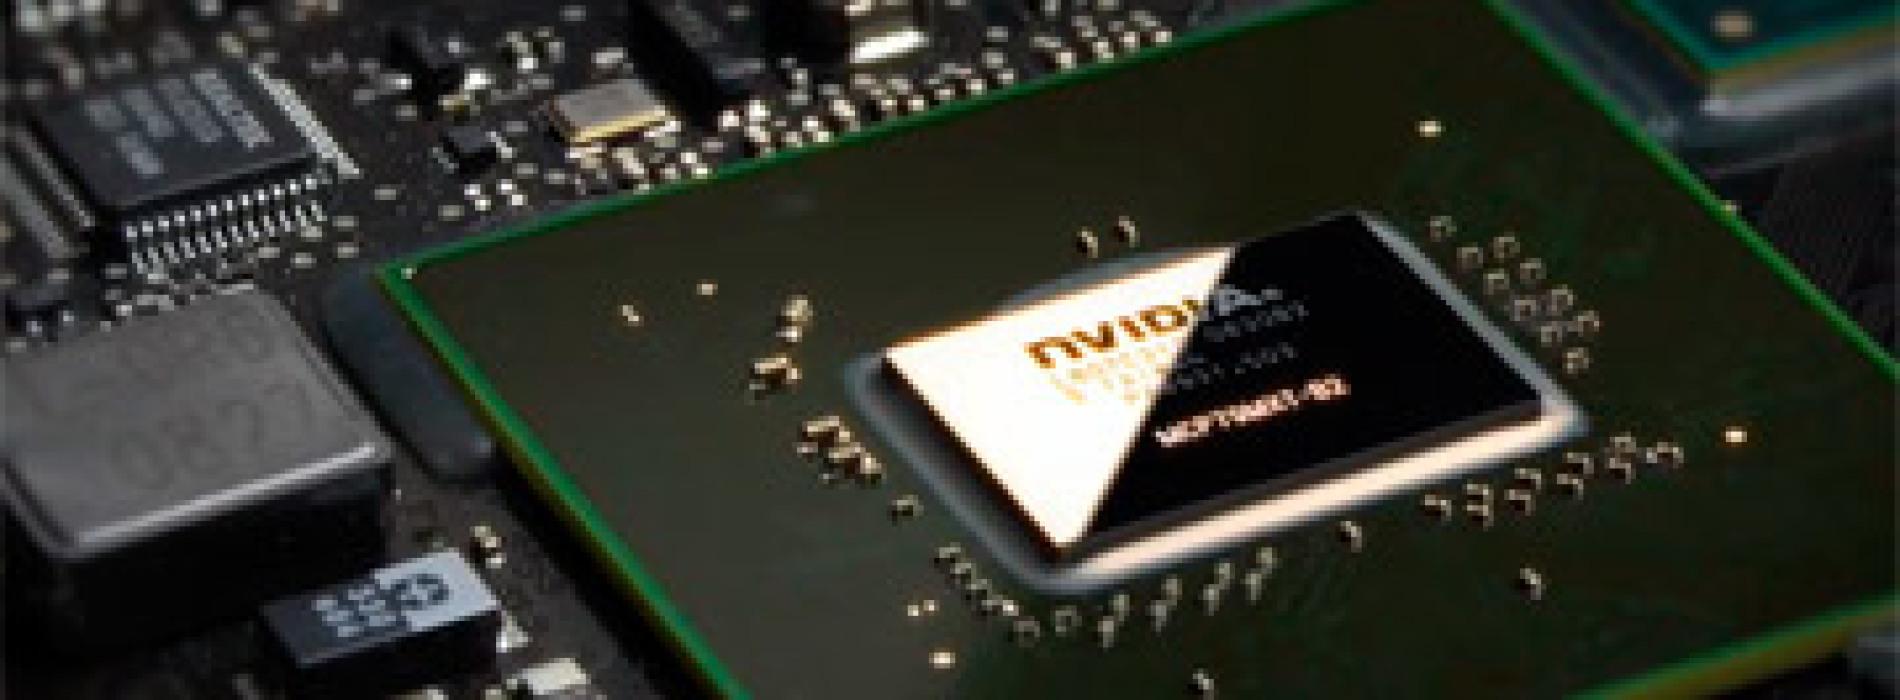 Ремонт ноутбука. Reballing  (реболлинг) или замена чипа видео